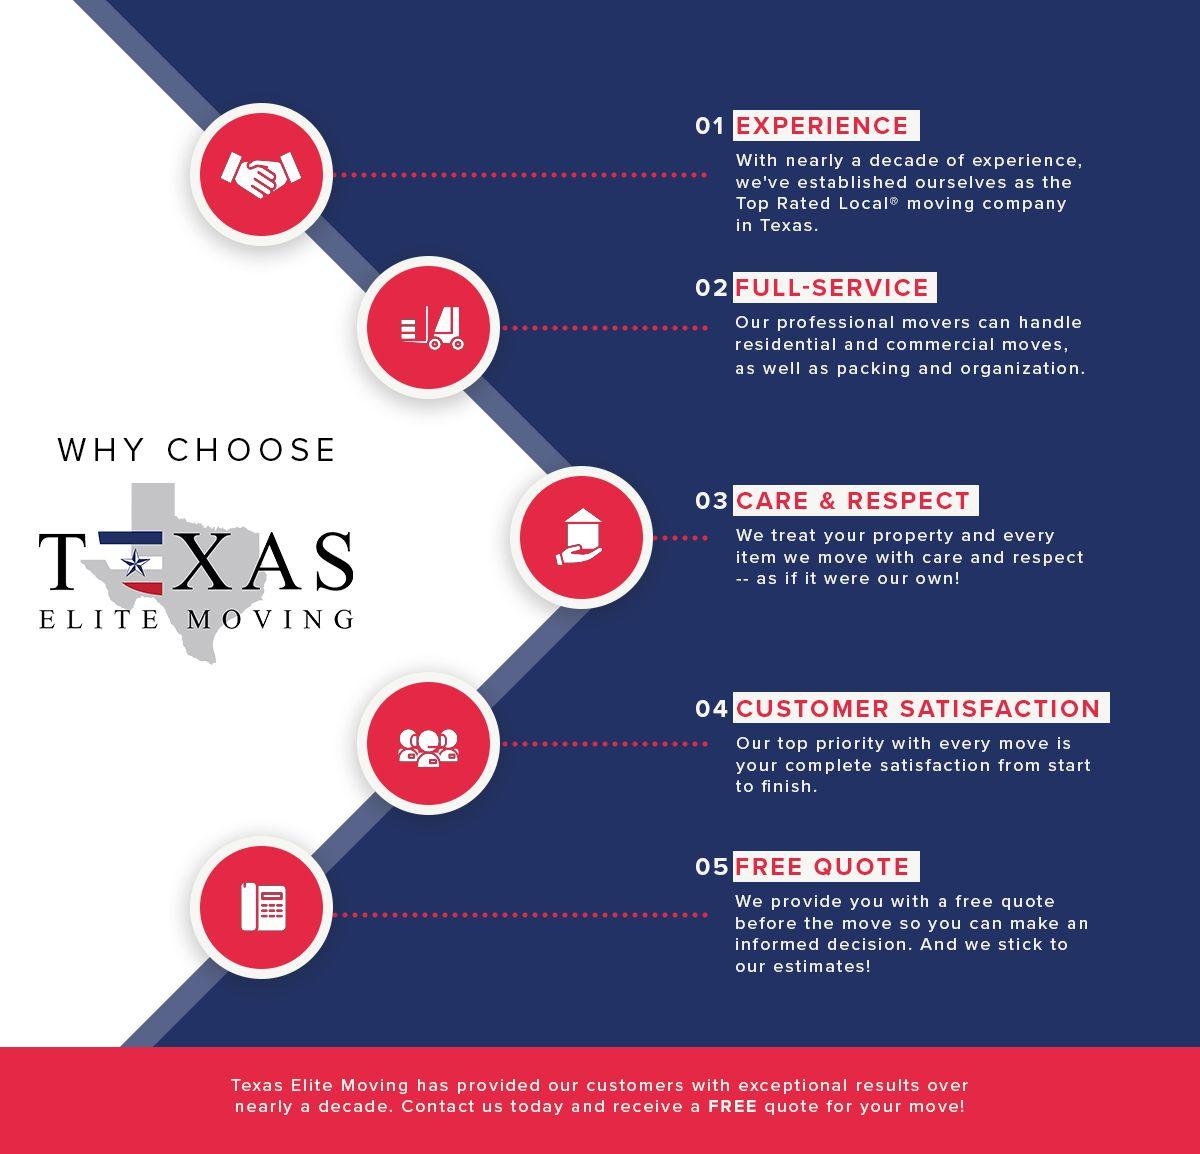 Why Choose Texas Elite Moving_.jpg